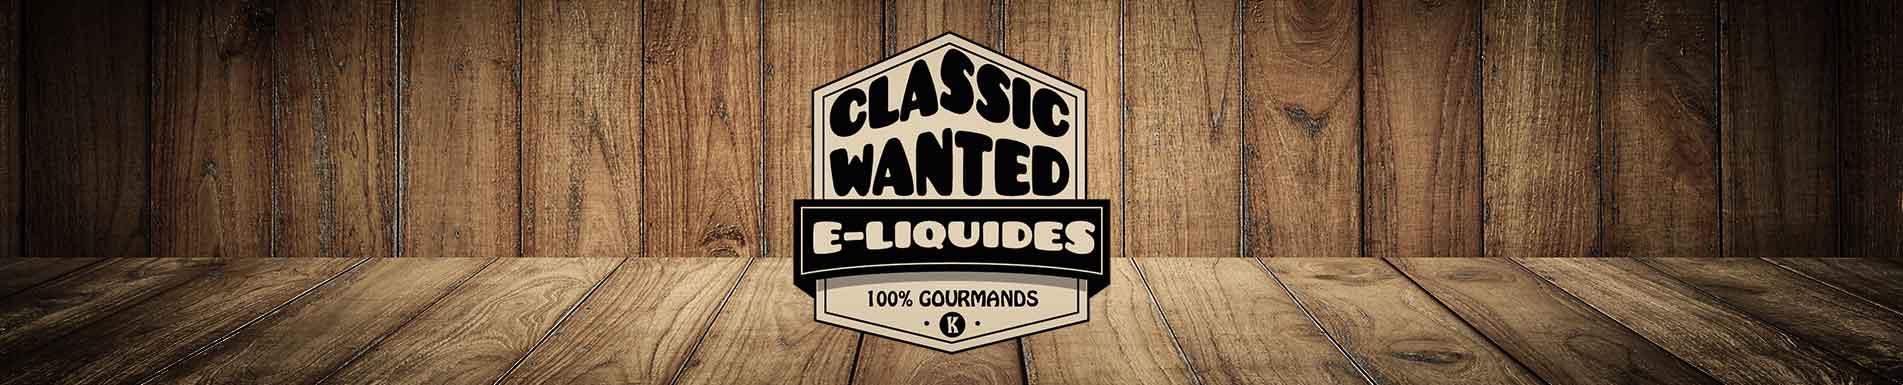 e-liquide classic wanted